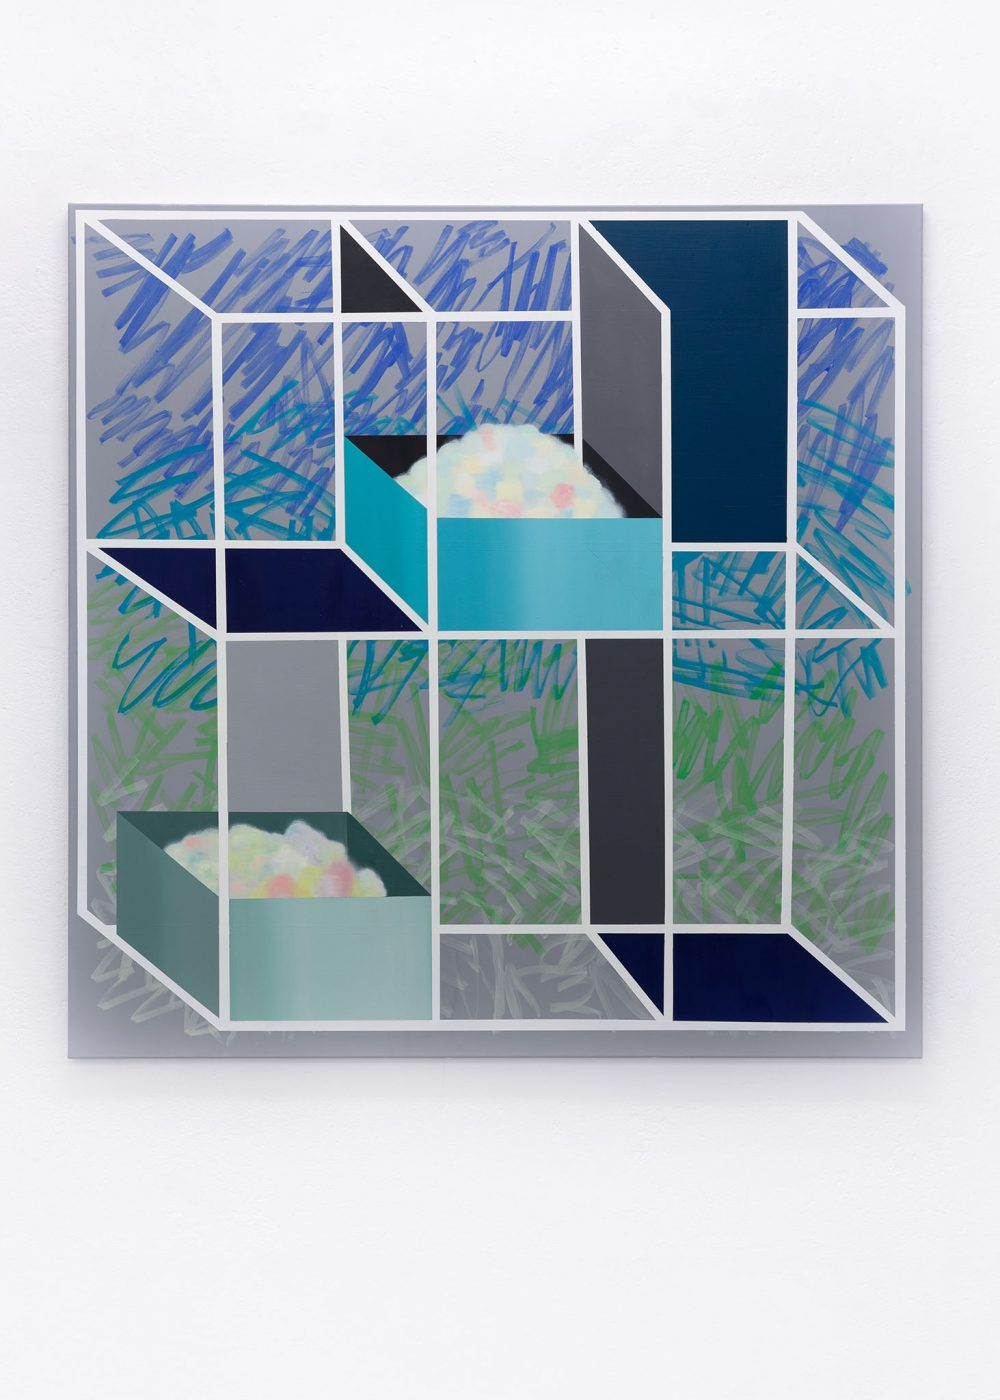 Anna Nero - Paintings - Öl und Acryl auf Leinwand - Falko Alexander gallery